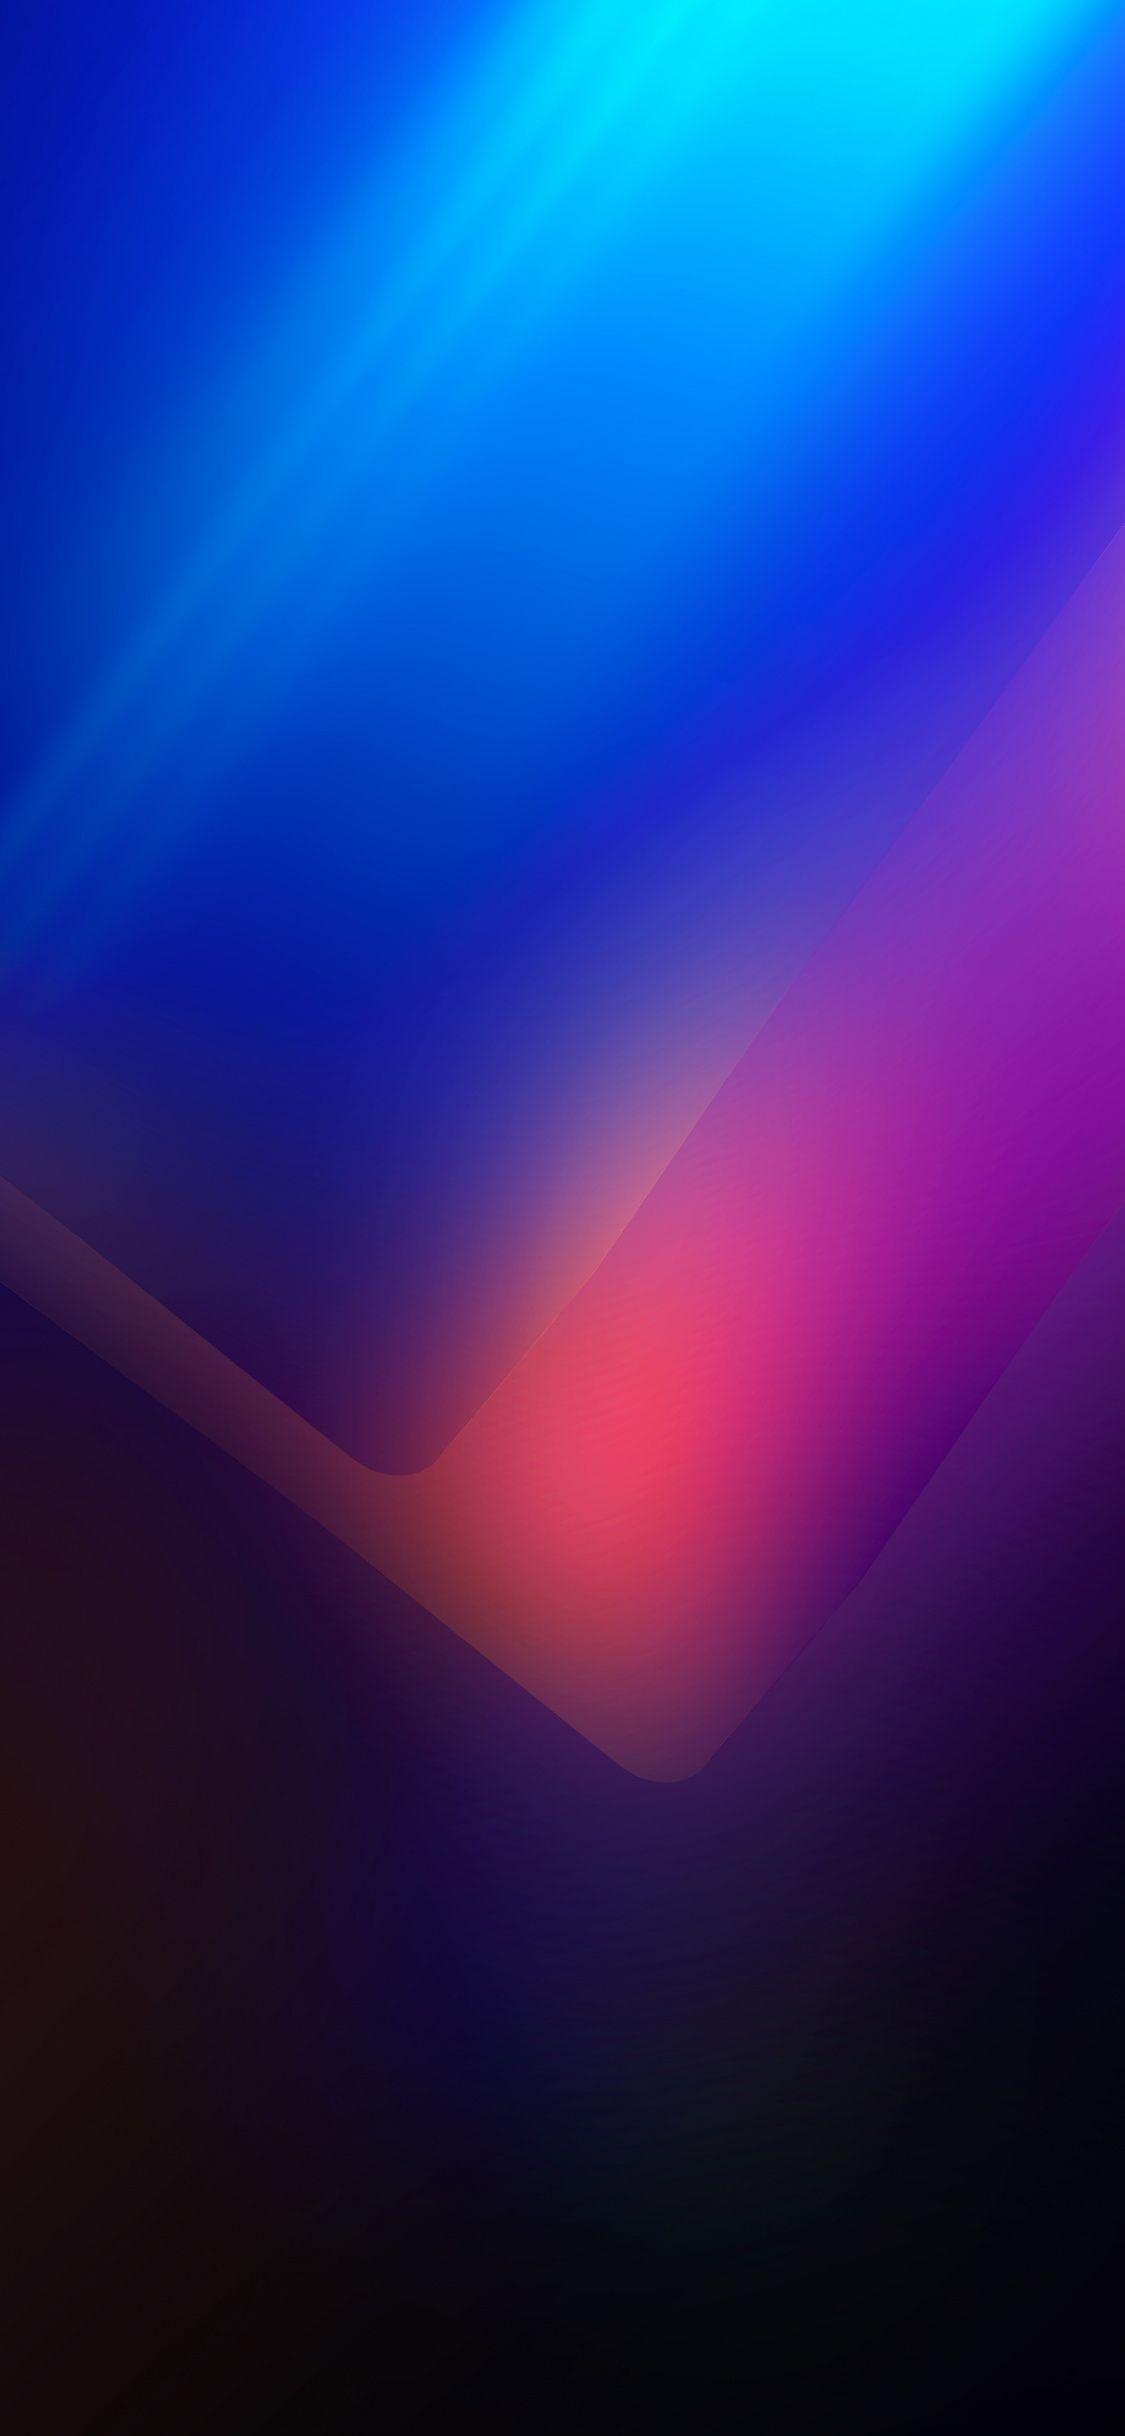 Download 1152x864 wallpaper Vibrant and vivid edge dark 1125x2436